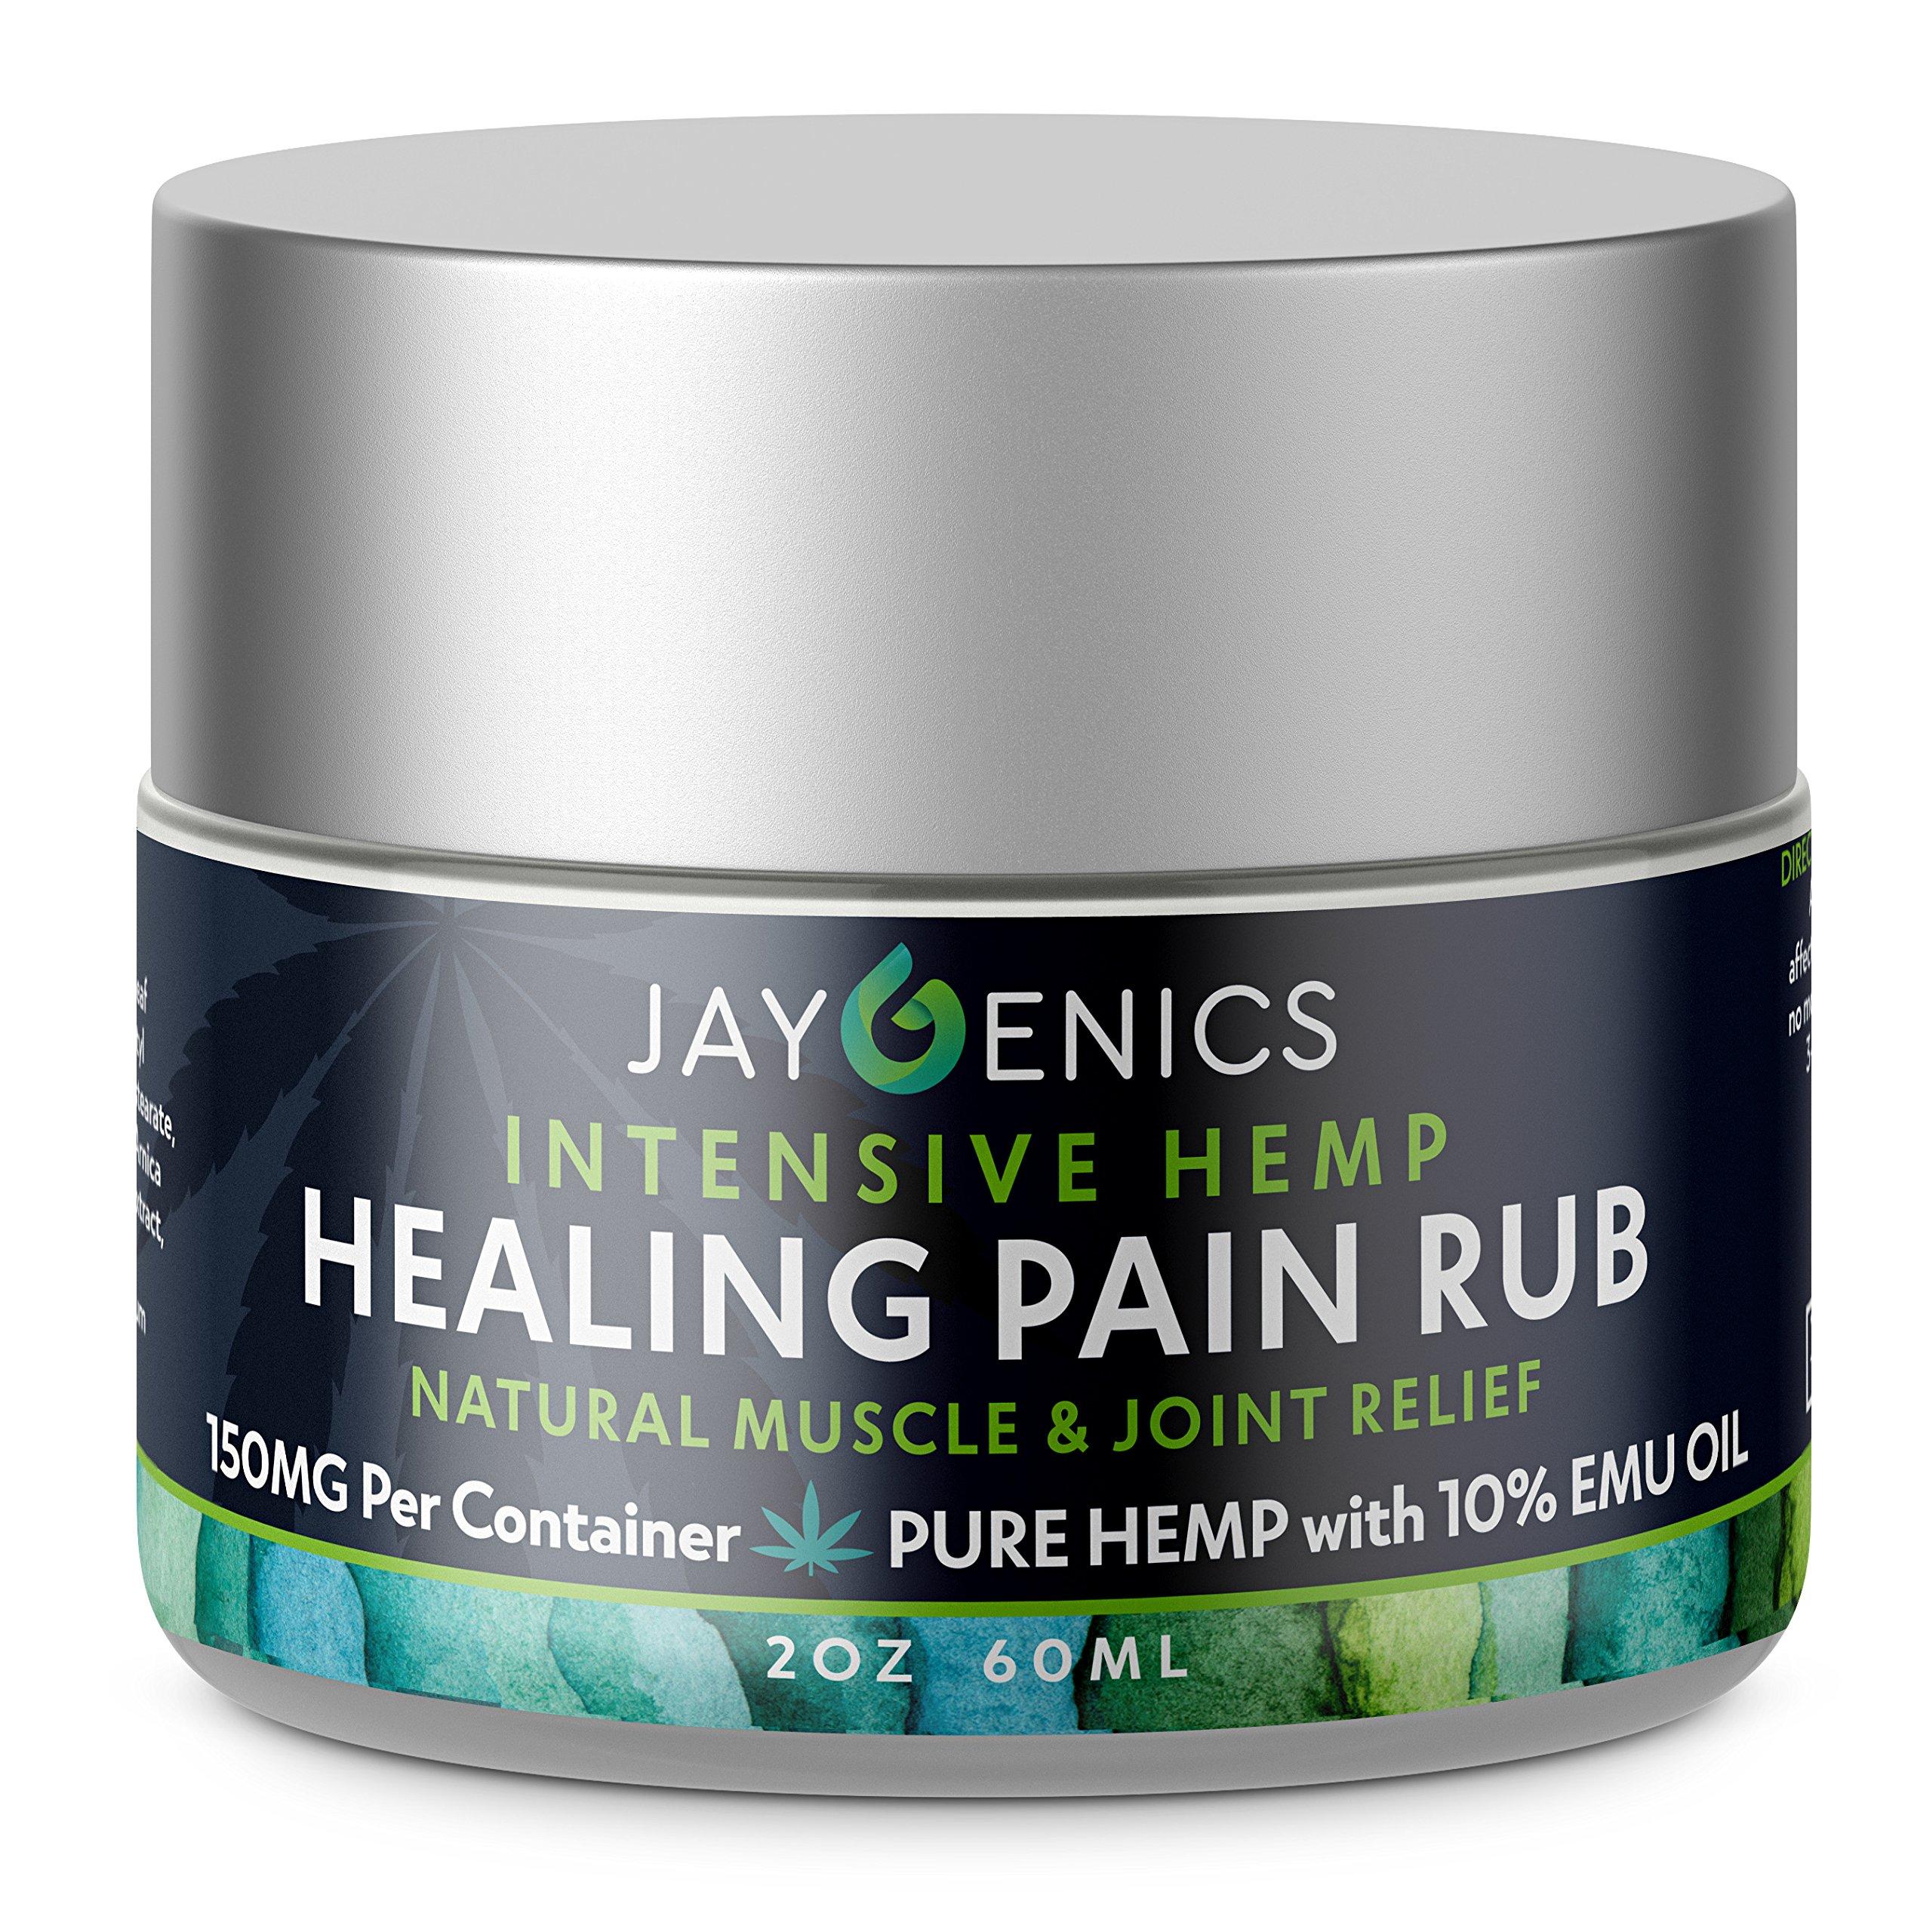 JAYGENICS Intensive Healing Rub, 150 Mg of Pure Hemp and 10% Emu Oil -2oz